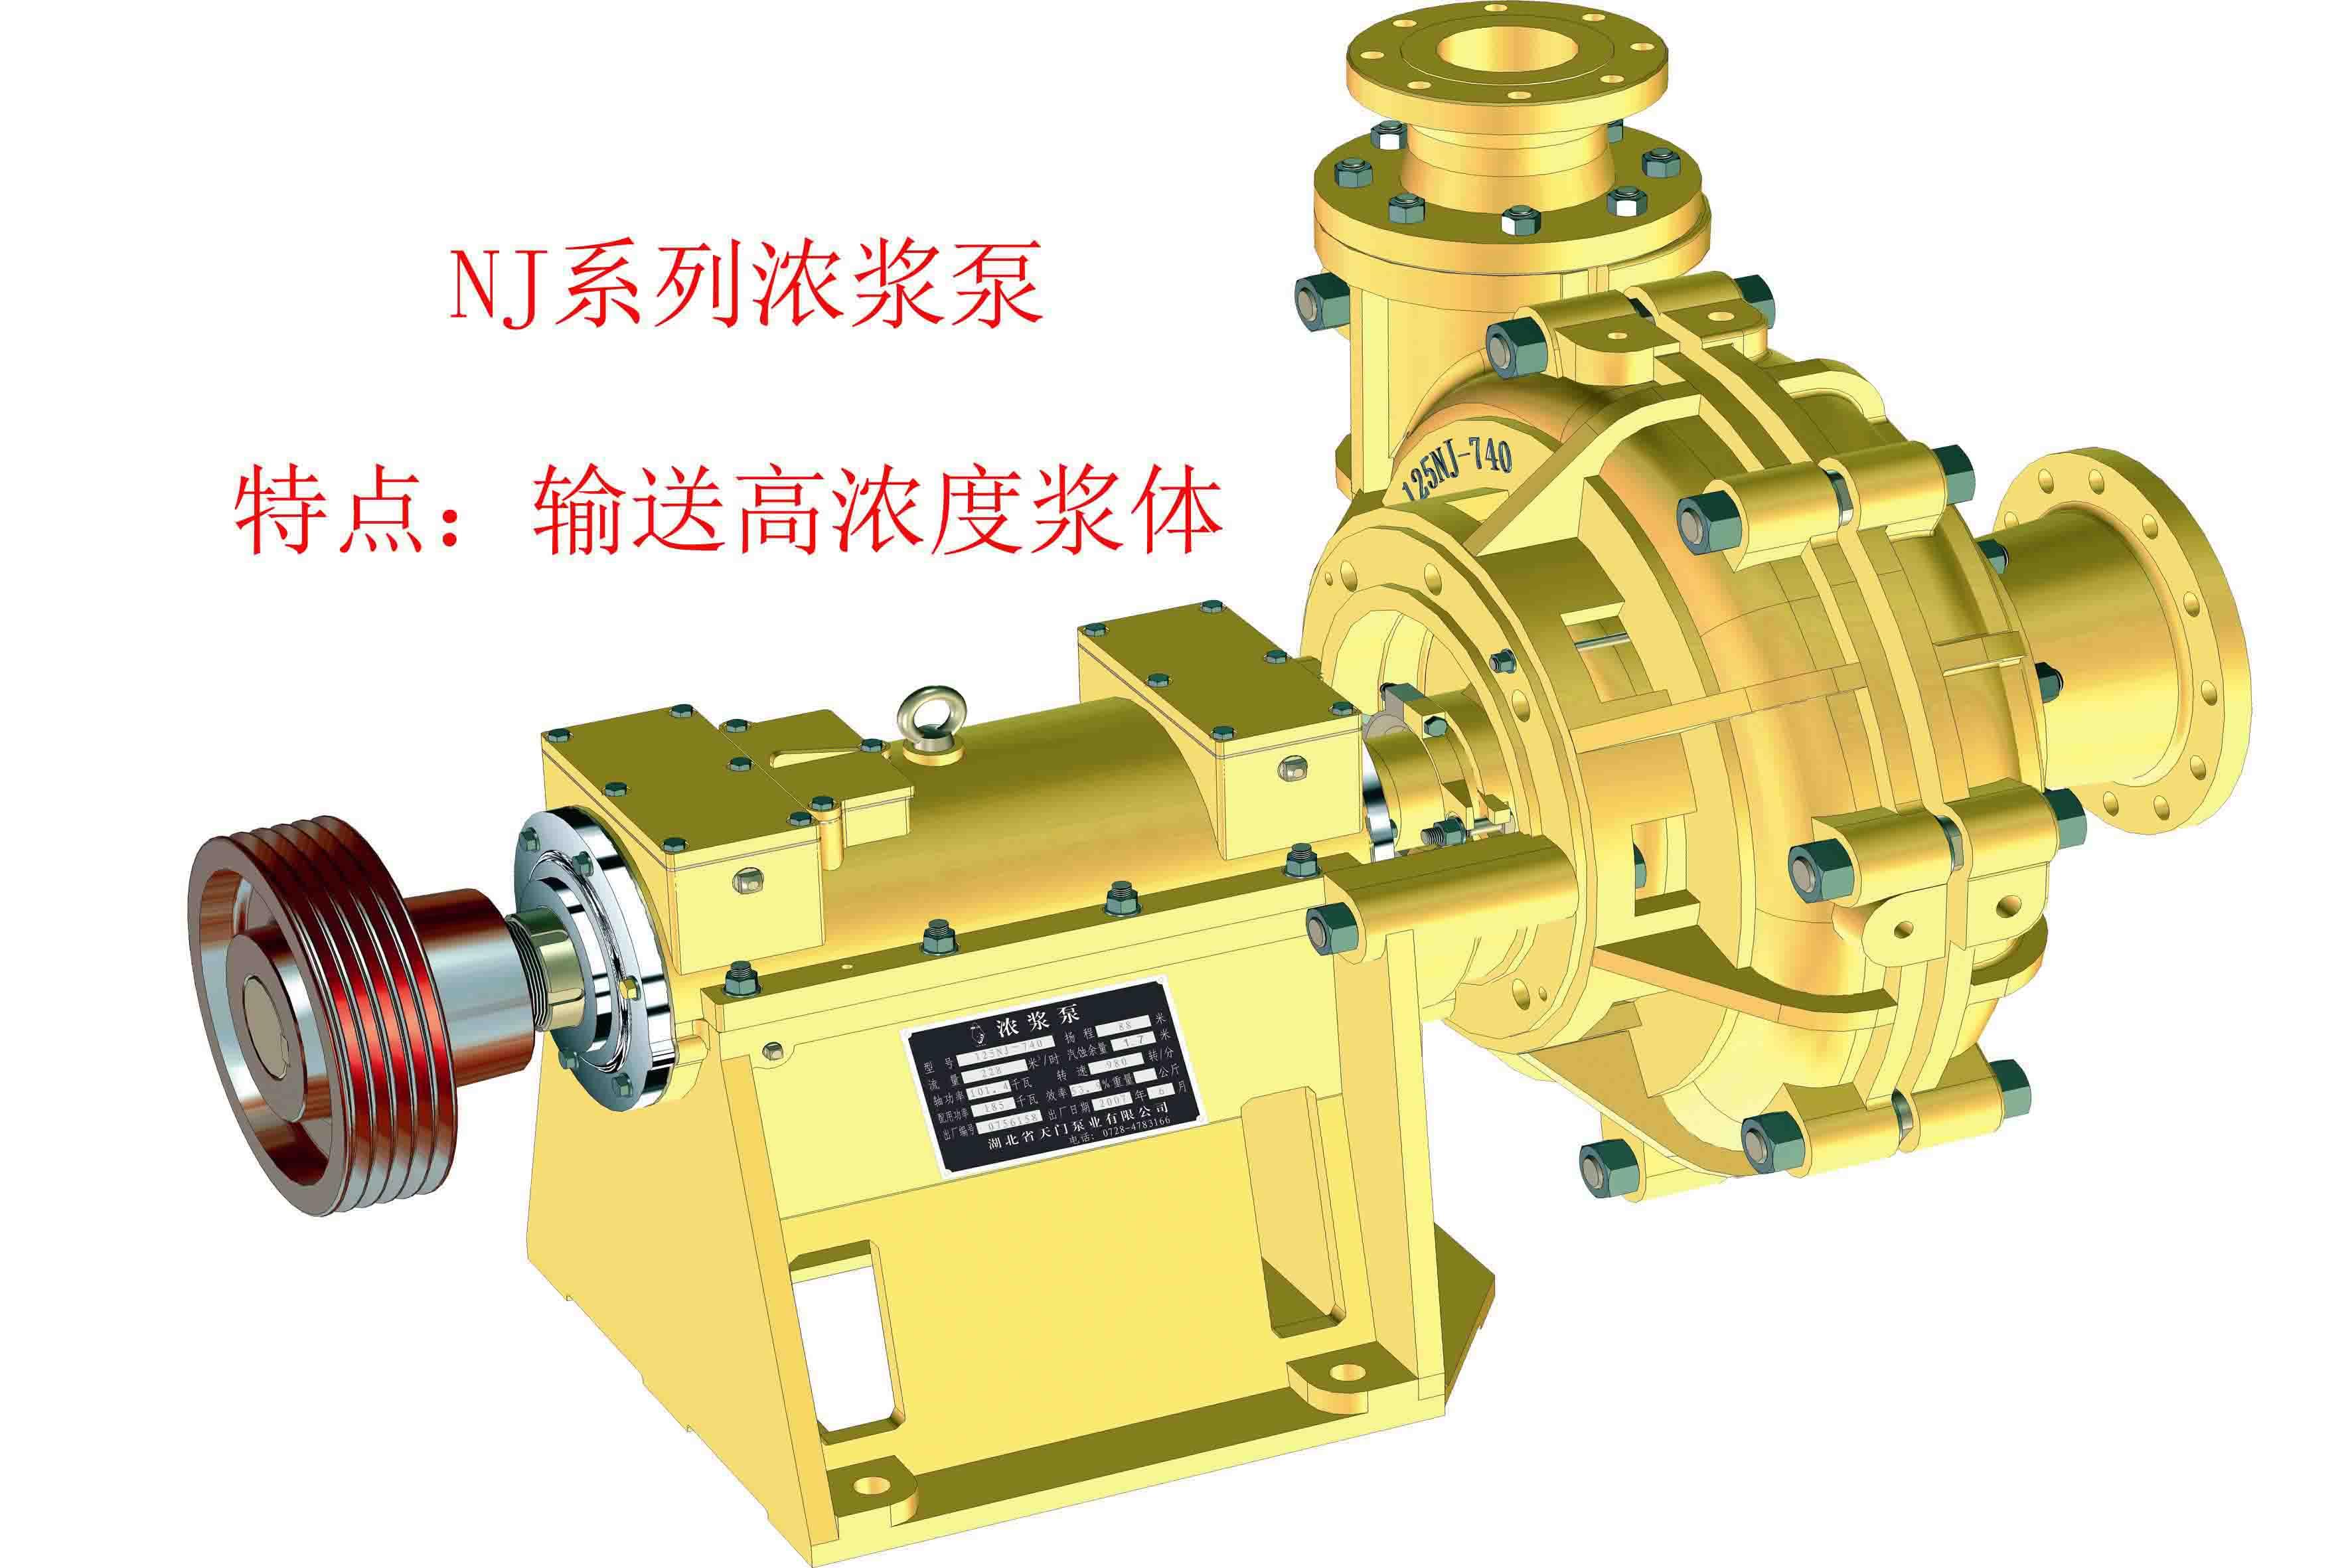 NJ系列浓浆泵